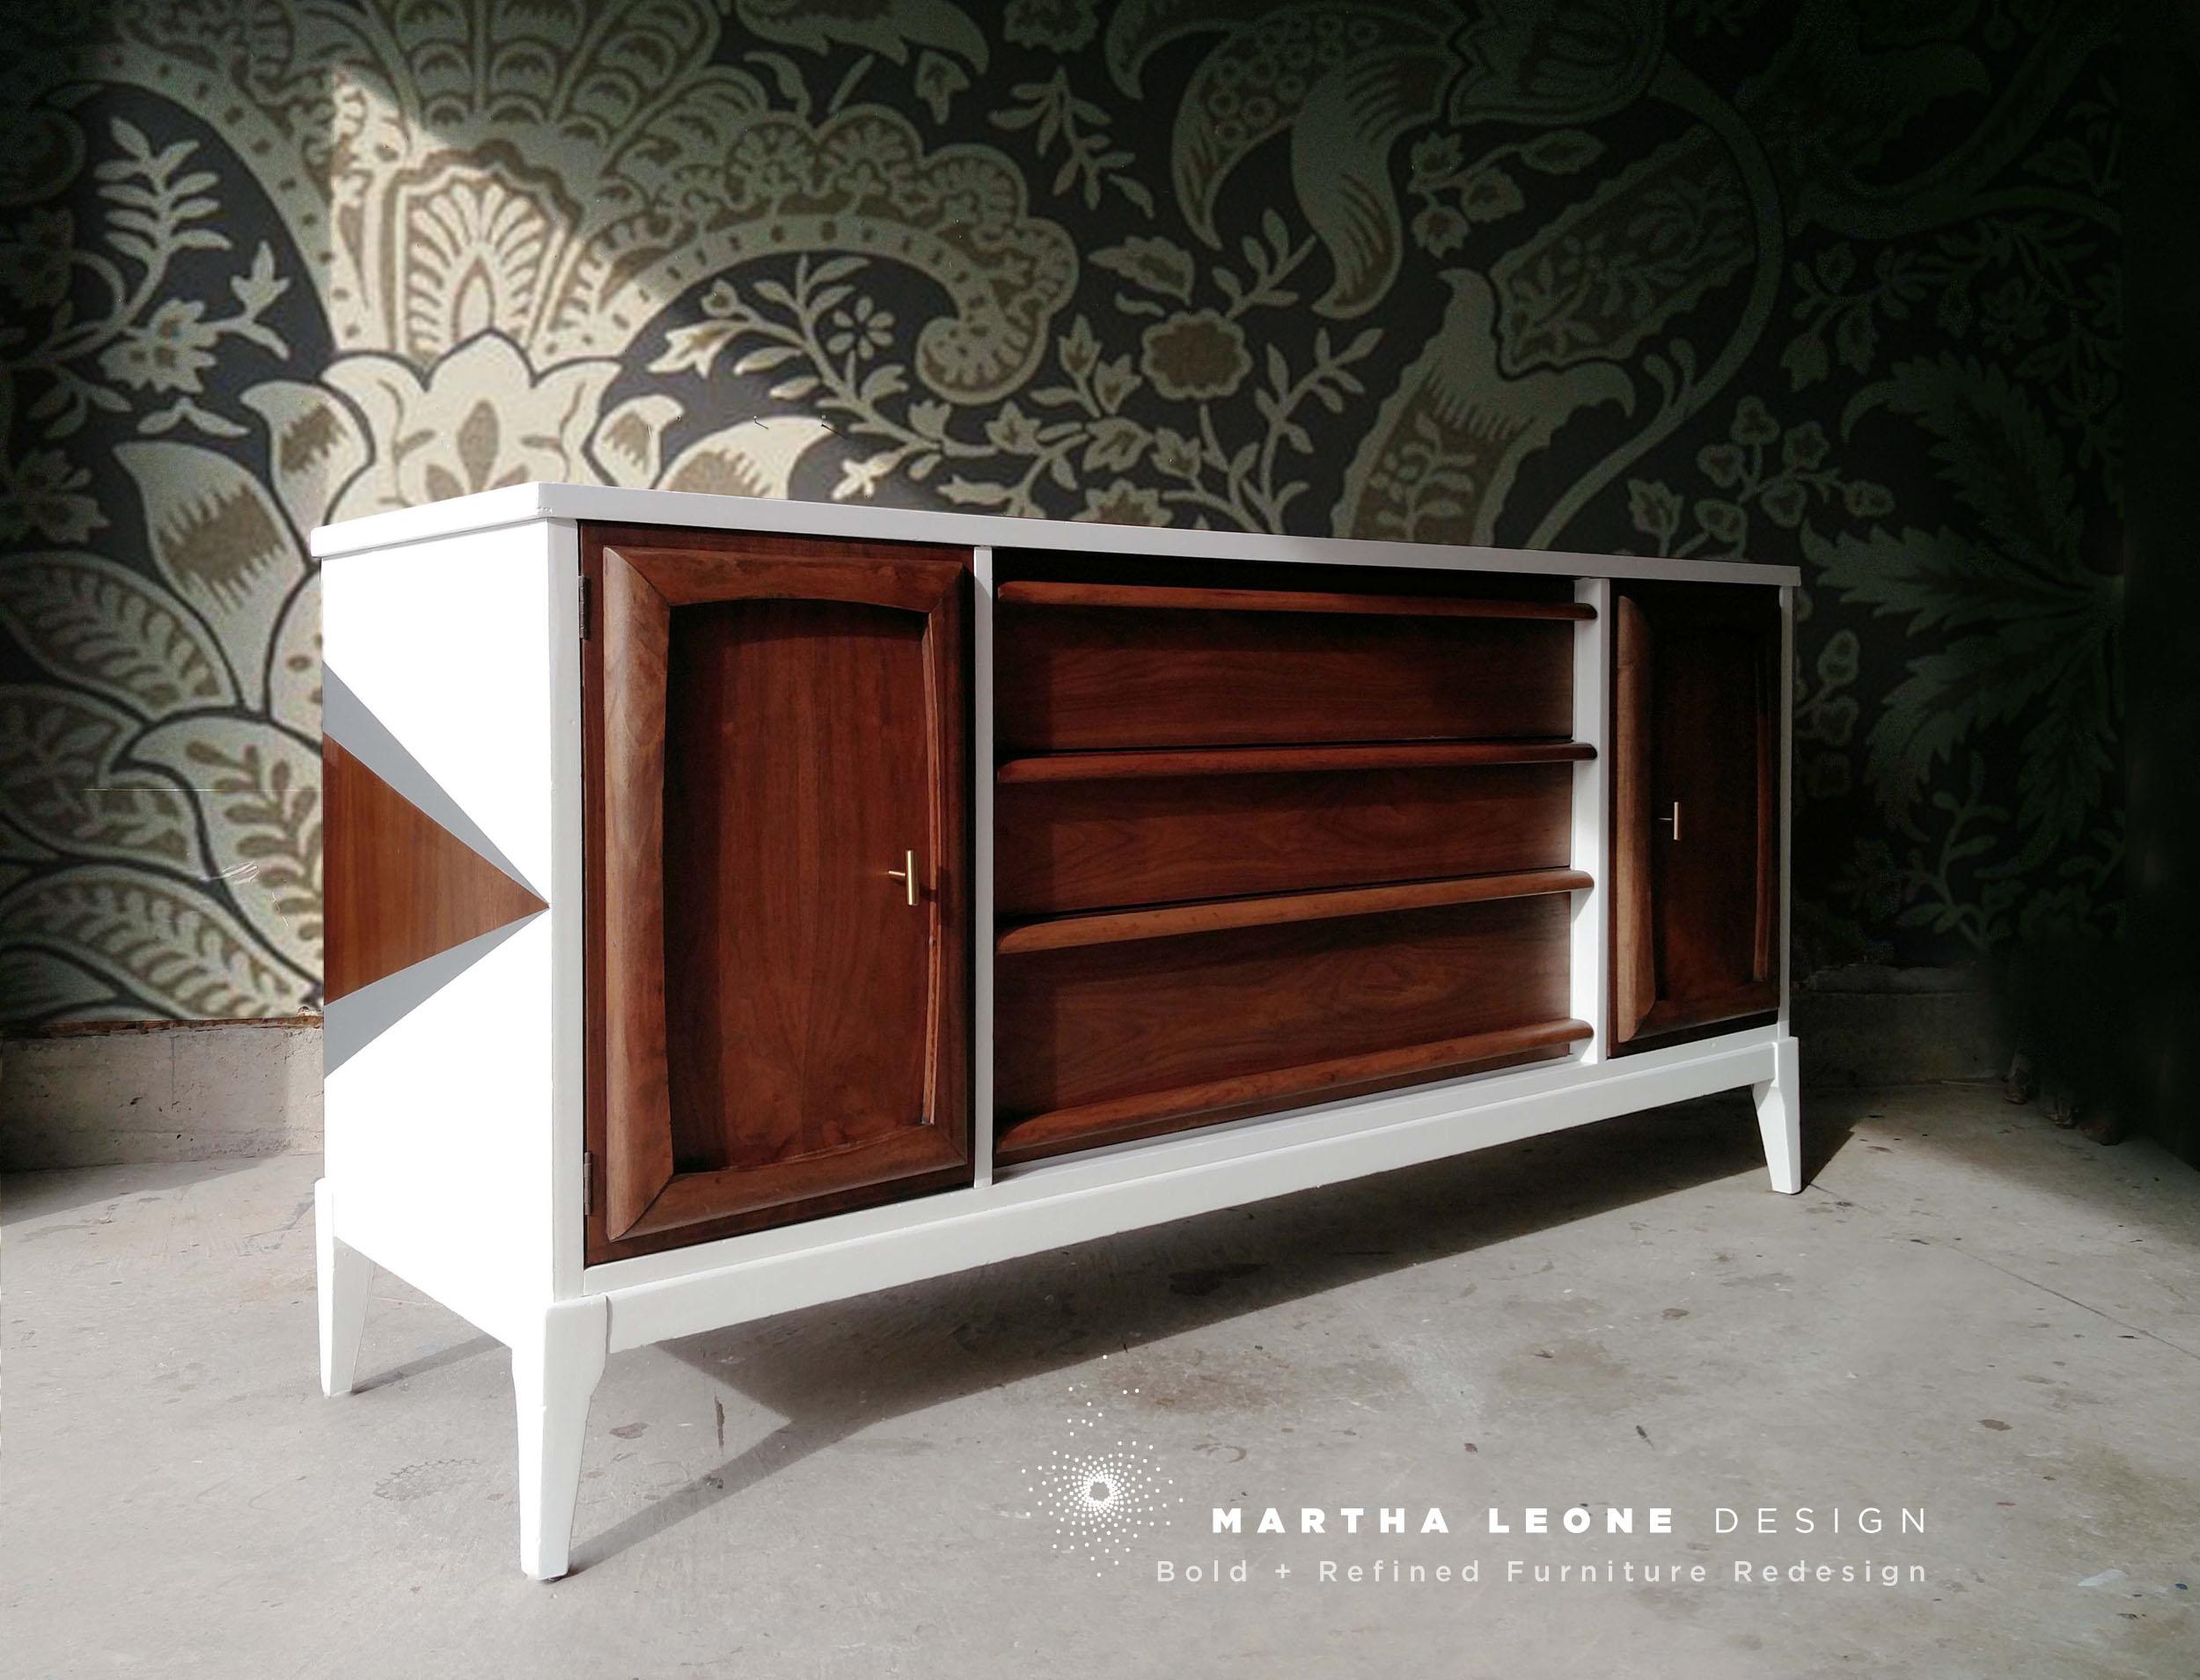 430b Martha Leone Design.jpg